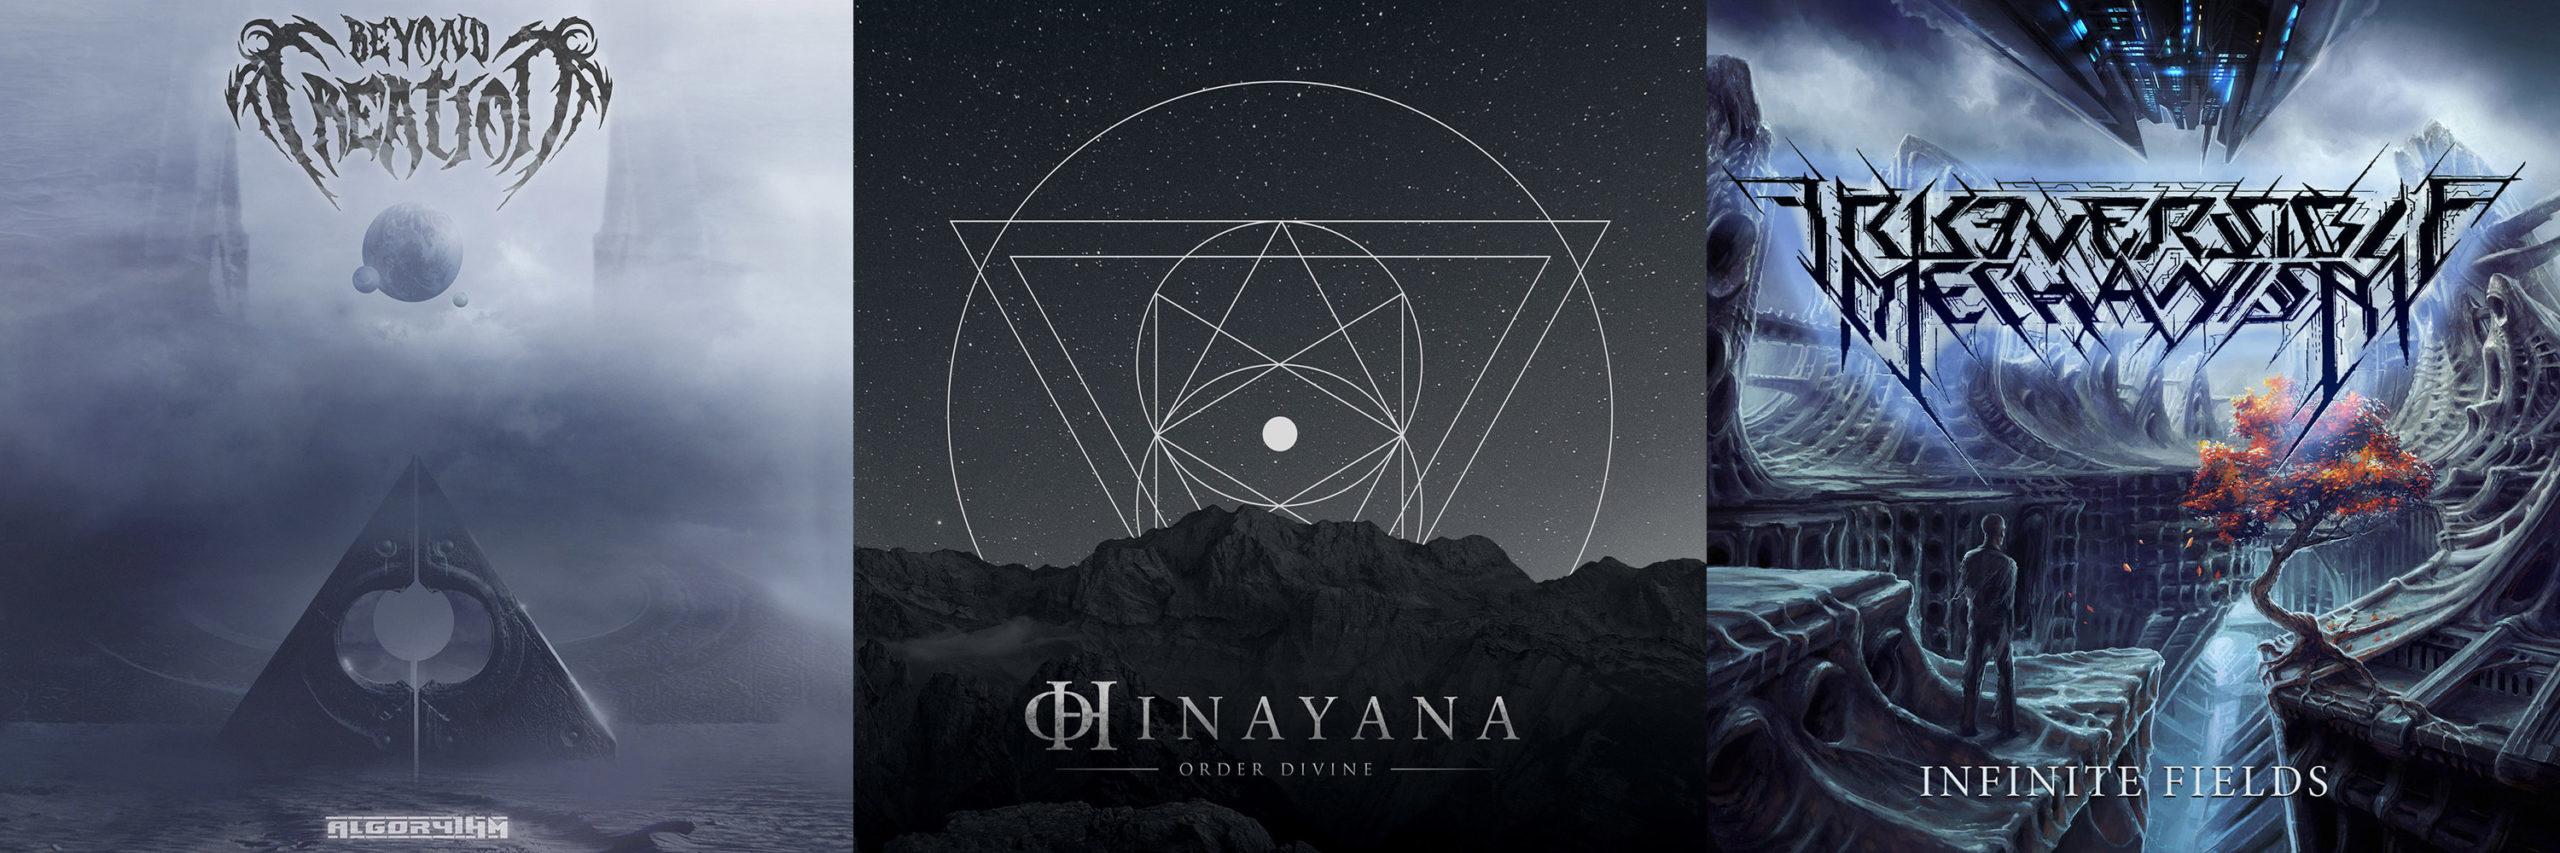 Beyond Creation / Hinayana / Irreversible Mechanism